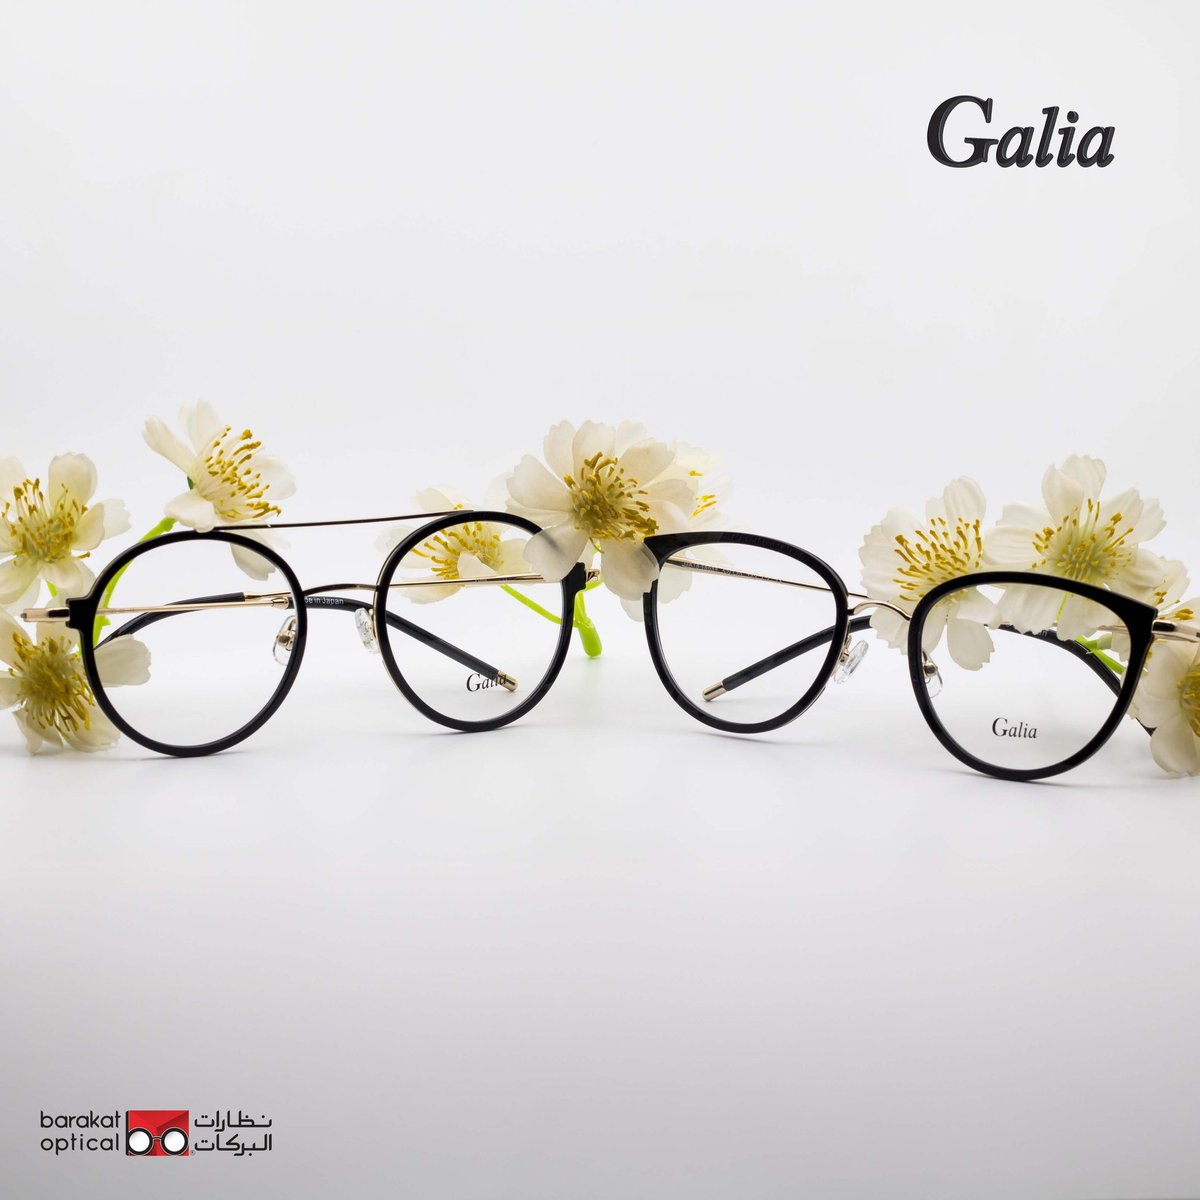 83ee95a22 Barakat Optical نظارات البركات (@BarakatOpticKSA)   Twitter